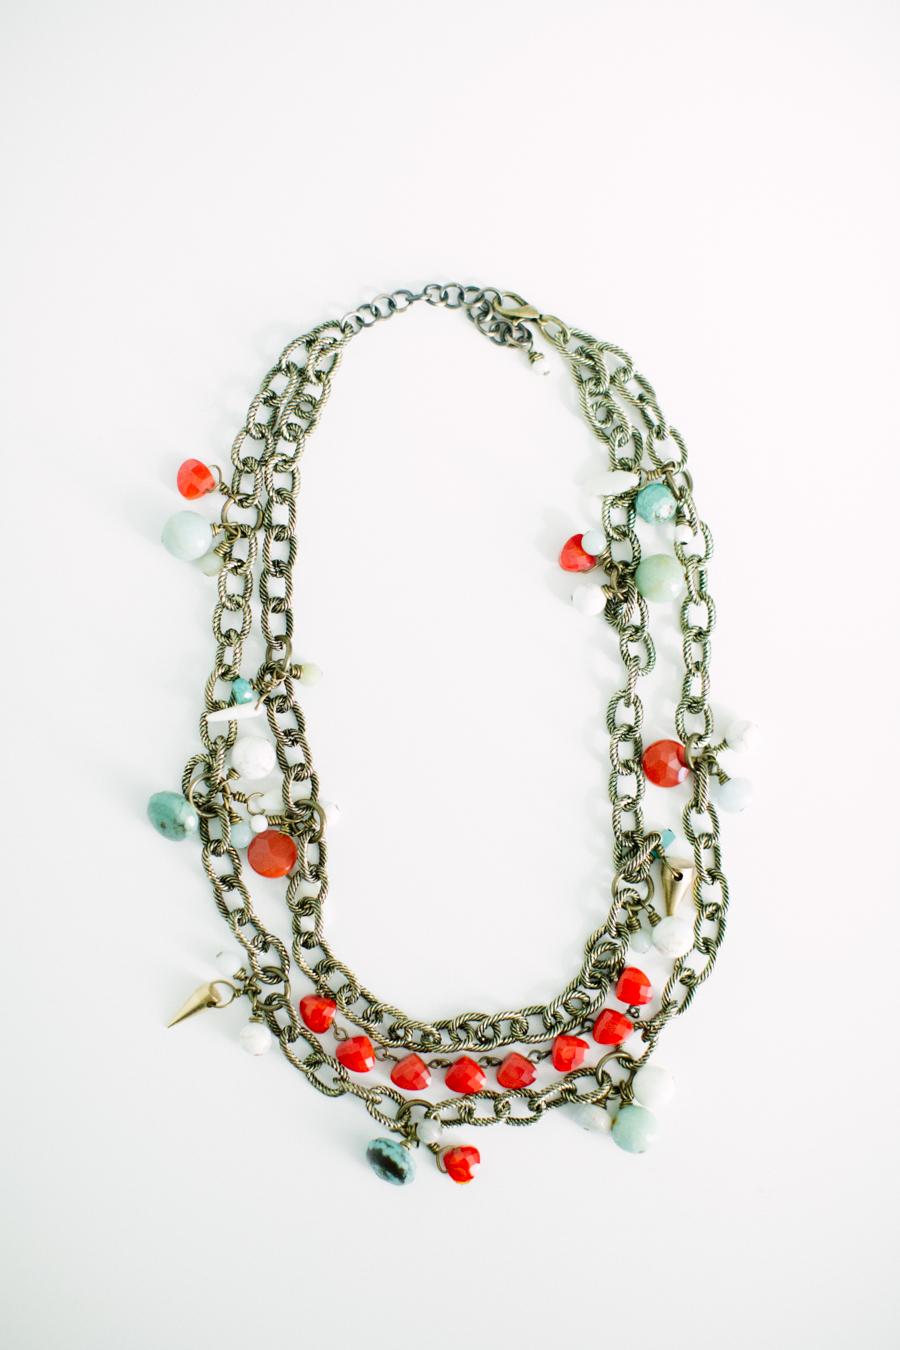 Jewelry-MackenzieKern-1.jpg